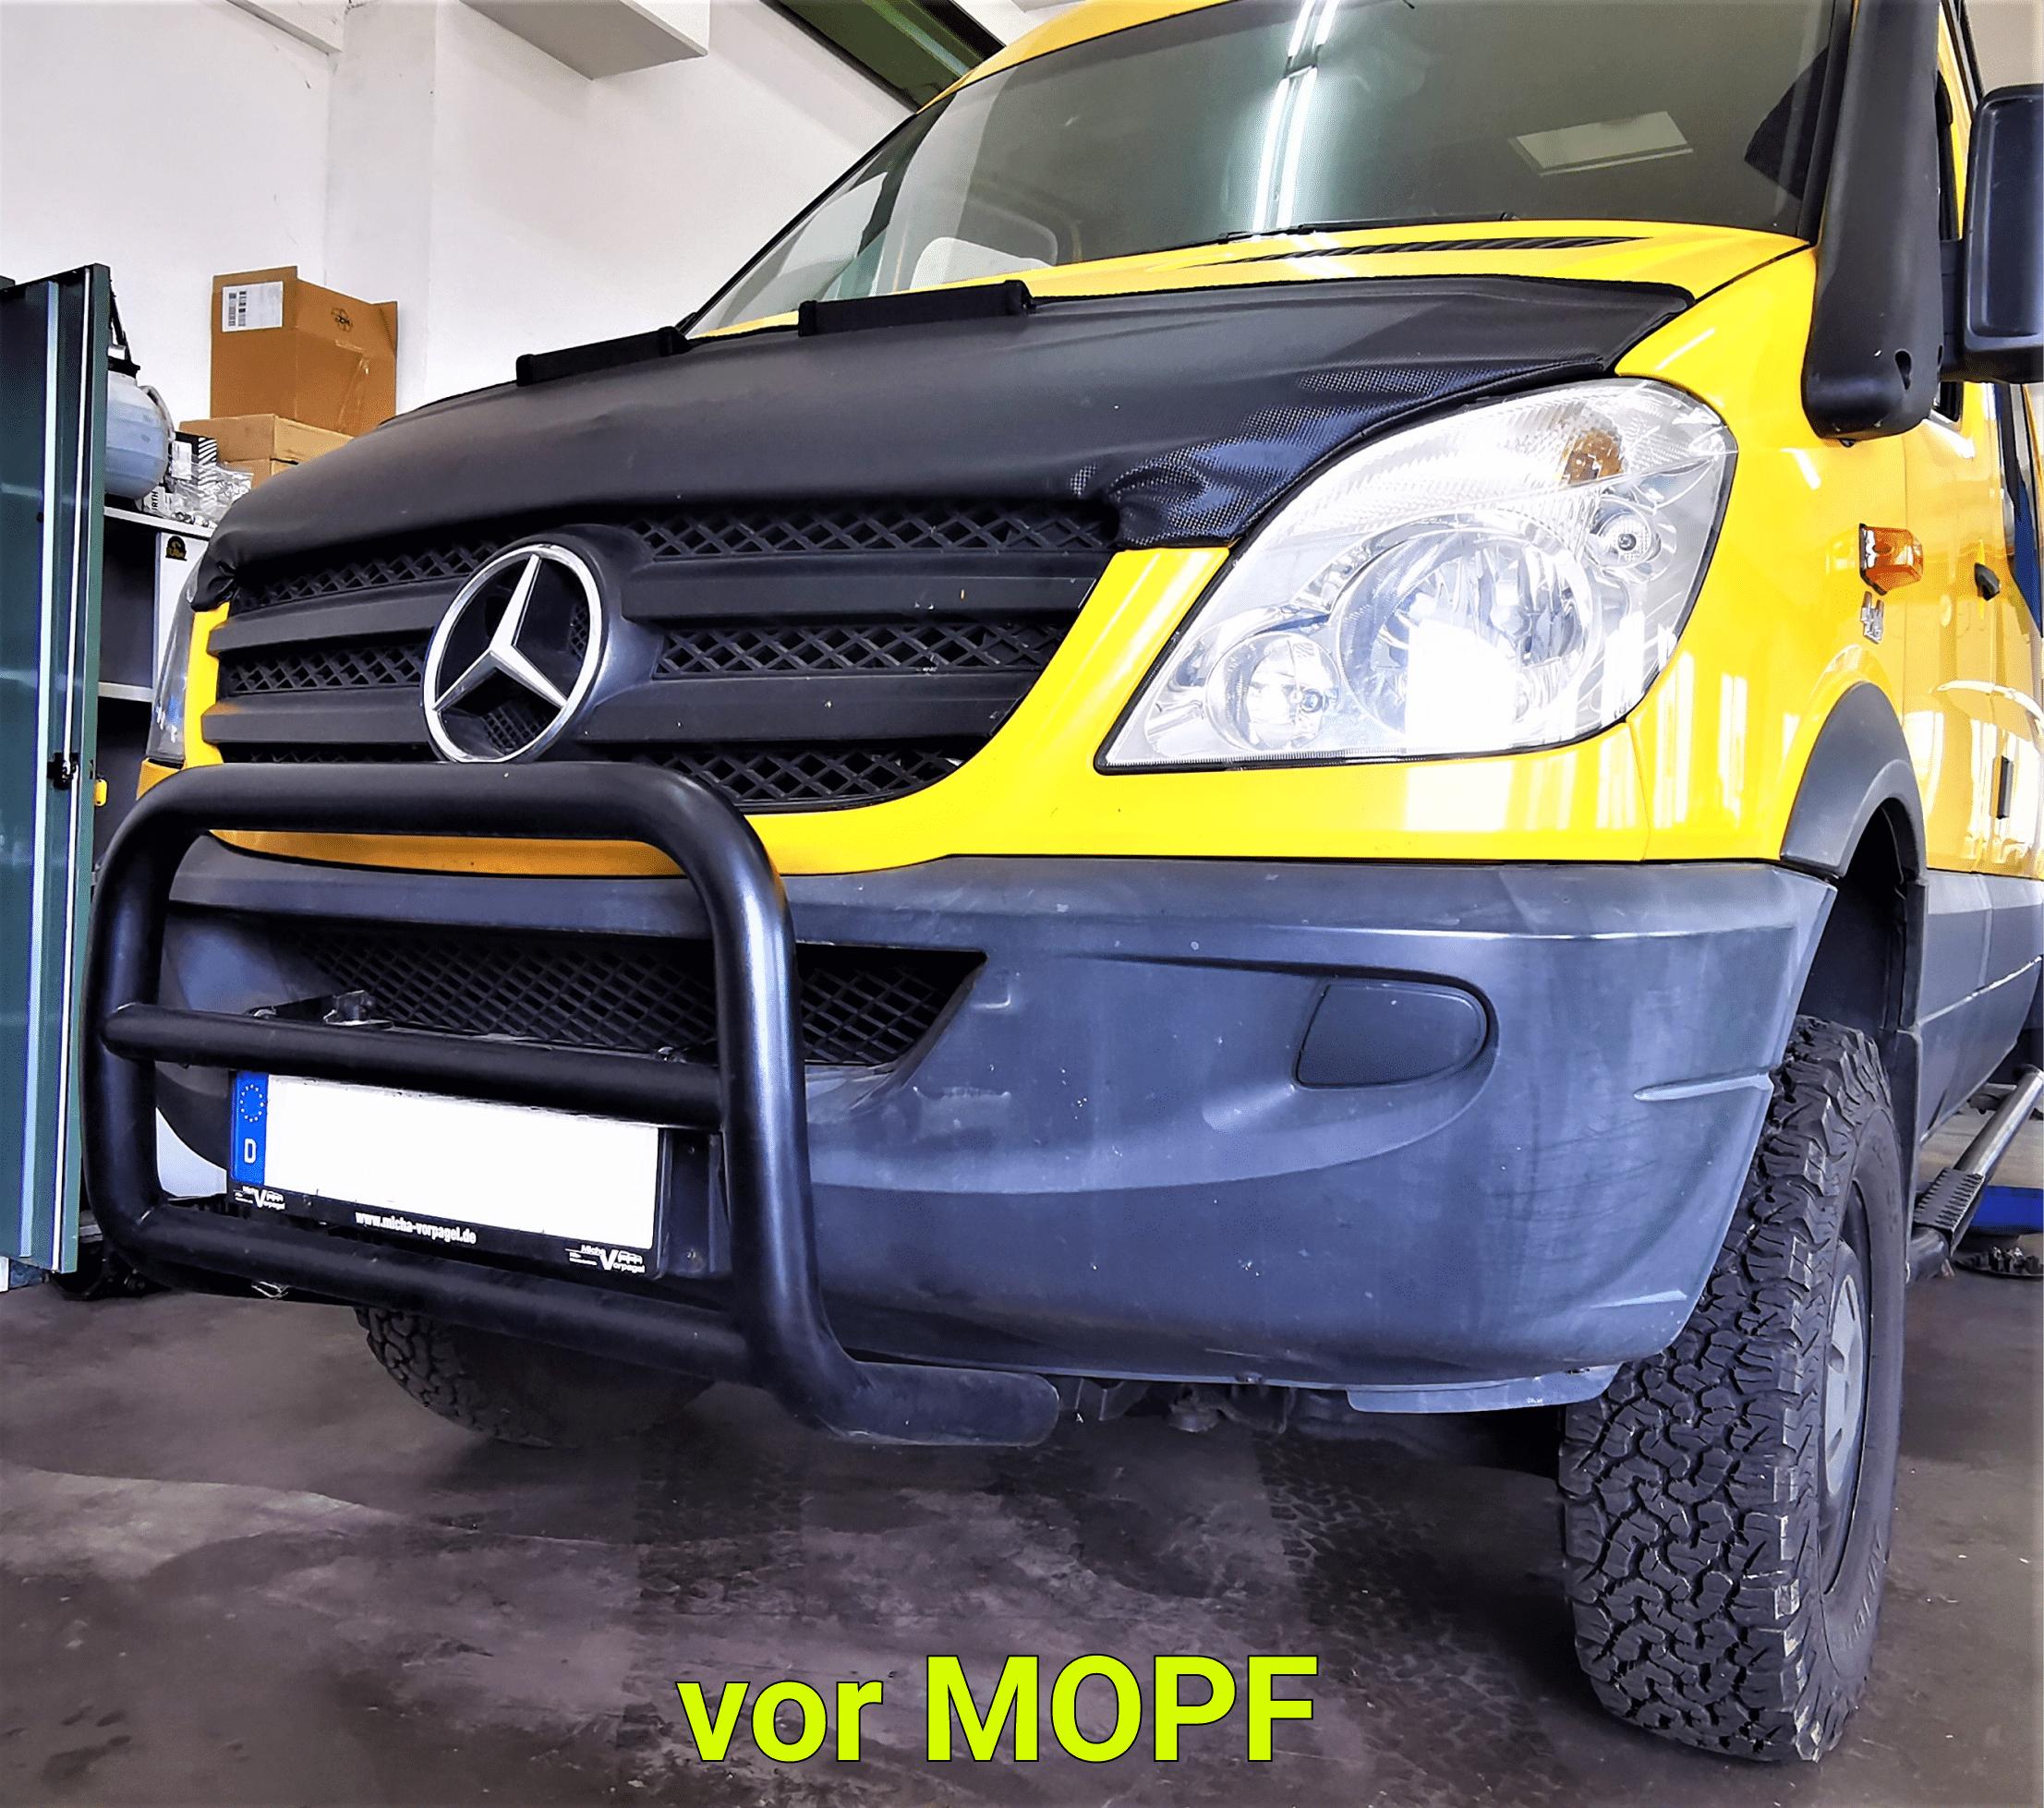 mb Sprinter 906 2006-2016 Frontschutzbügel